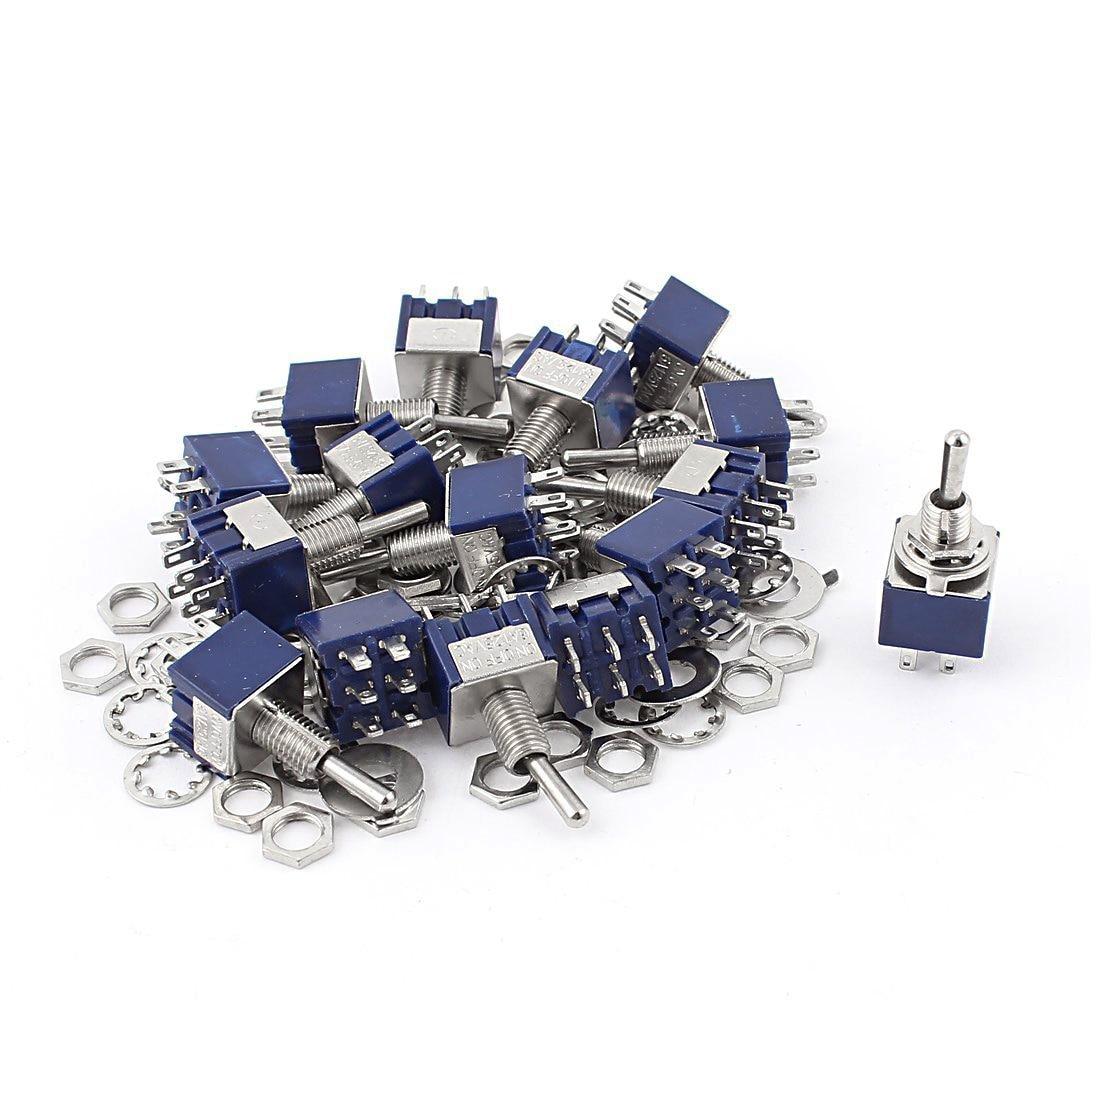 20Pcs AC 125V 6A ON-OFF-ON DPDT Locking Mini Toggle Switch Blue 6mm [vk] av044746a200k switch pushbutton dpdt 6a 125v switch